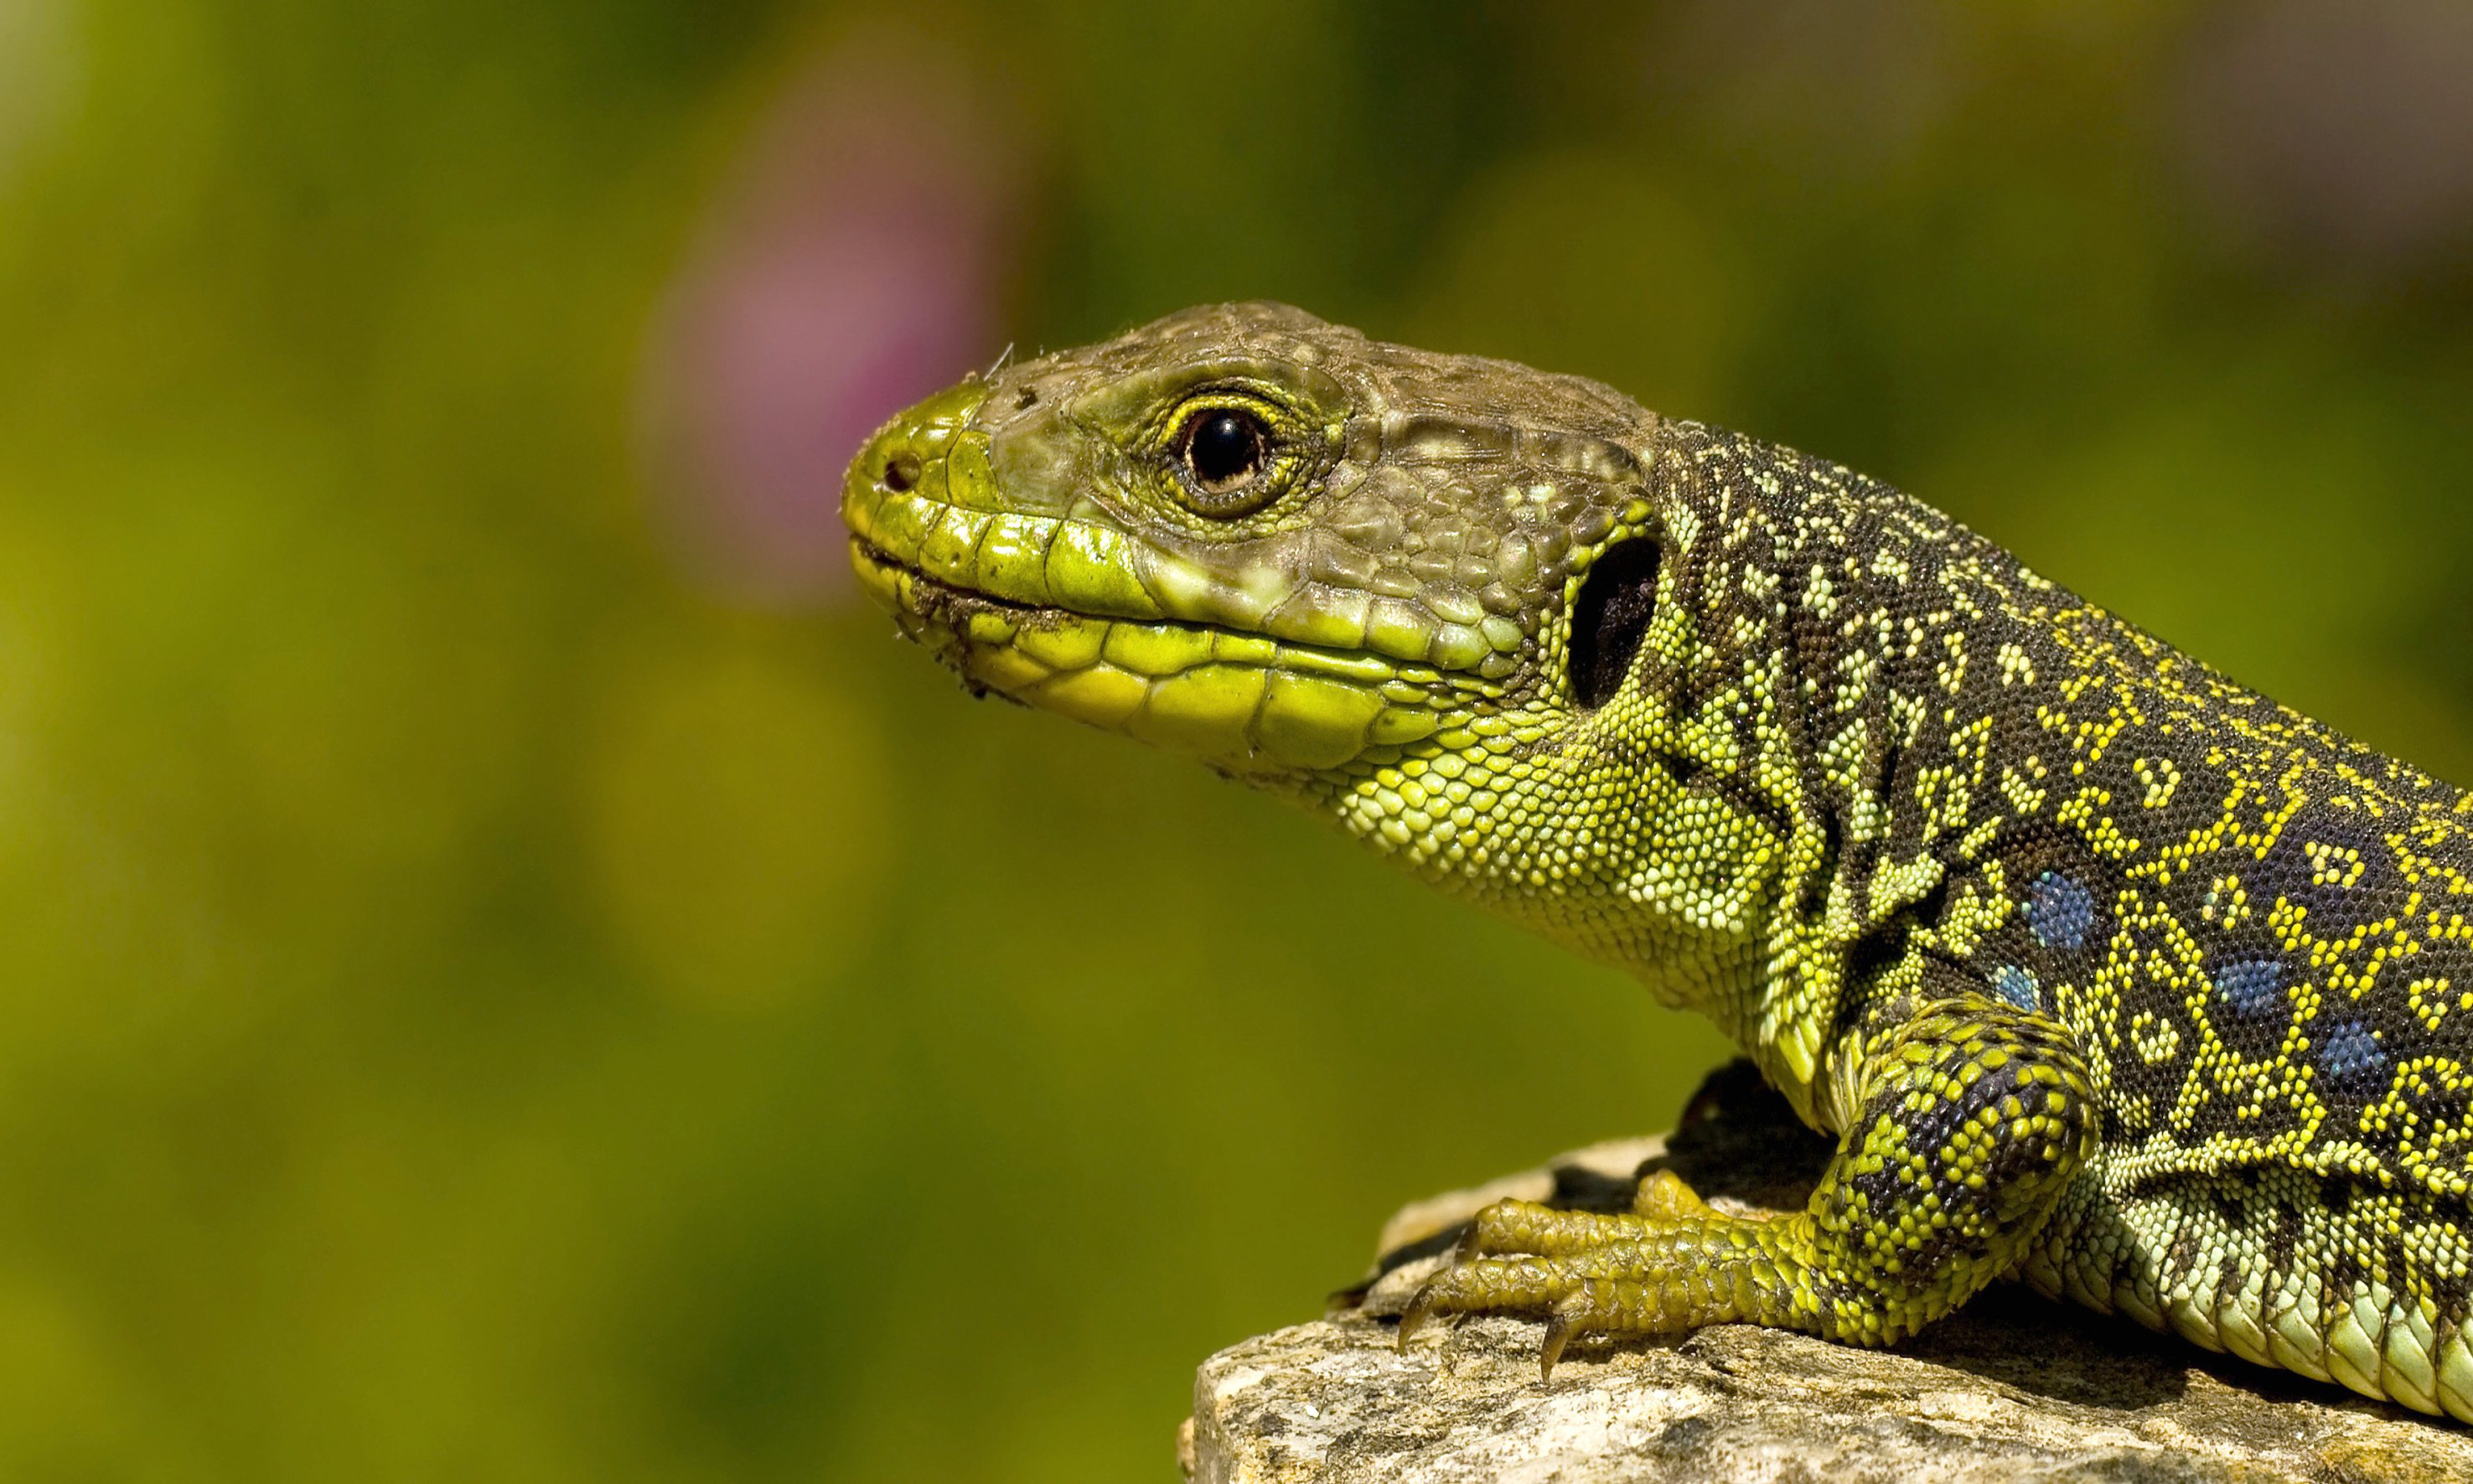 Lizard Full HD Wallpaper and Background 2951x1771 ID349634